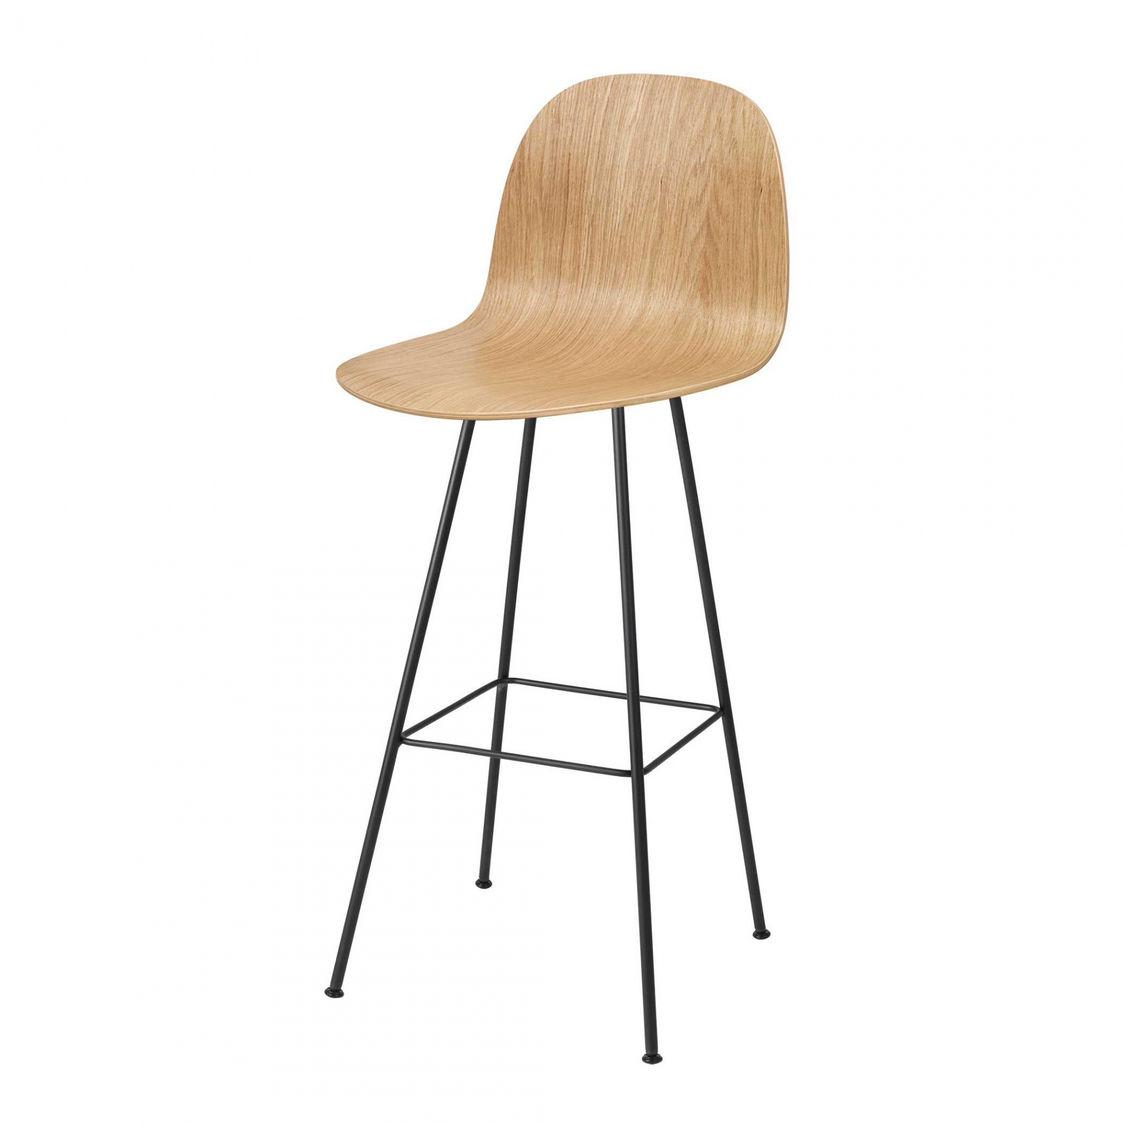 Gubi 2d bar chair barhocker gubi for Barhocker 2d cad